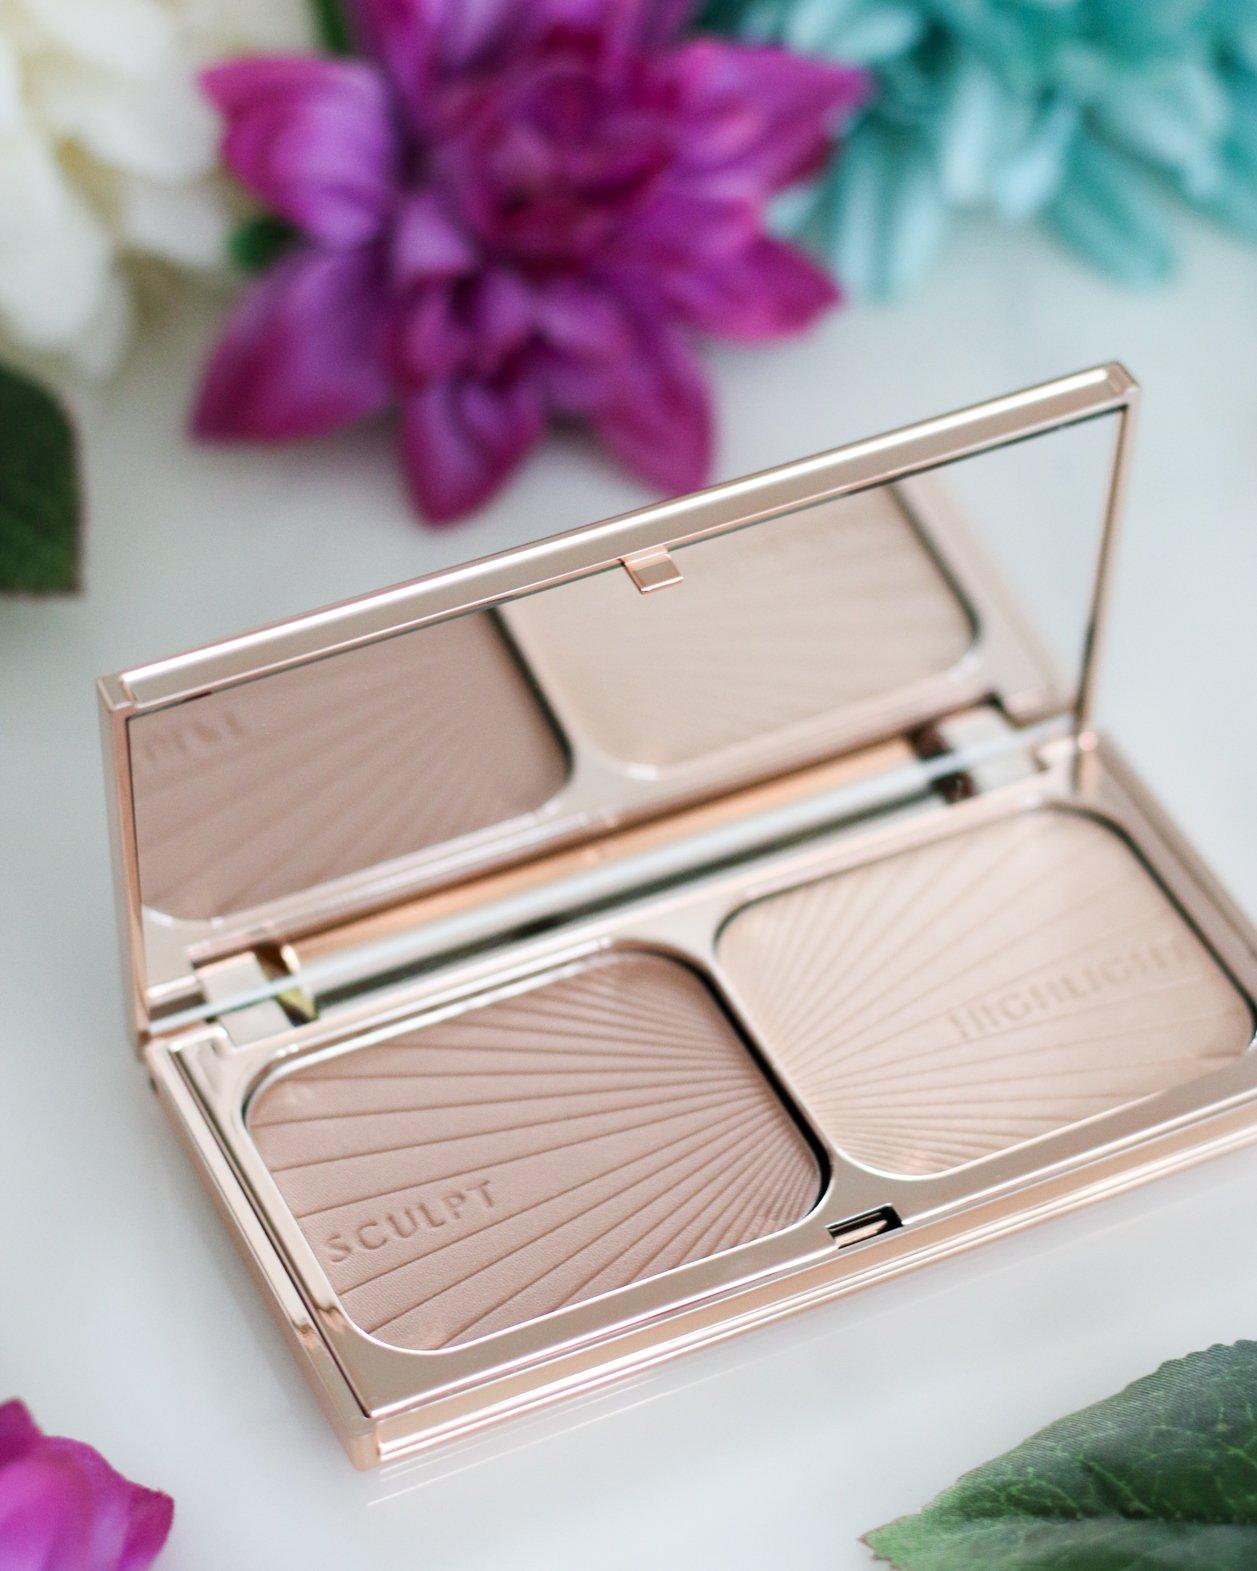 Charlotte Tilbury Bronze & Glow Palette Review